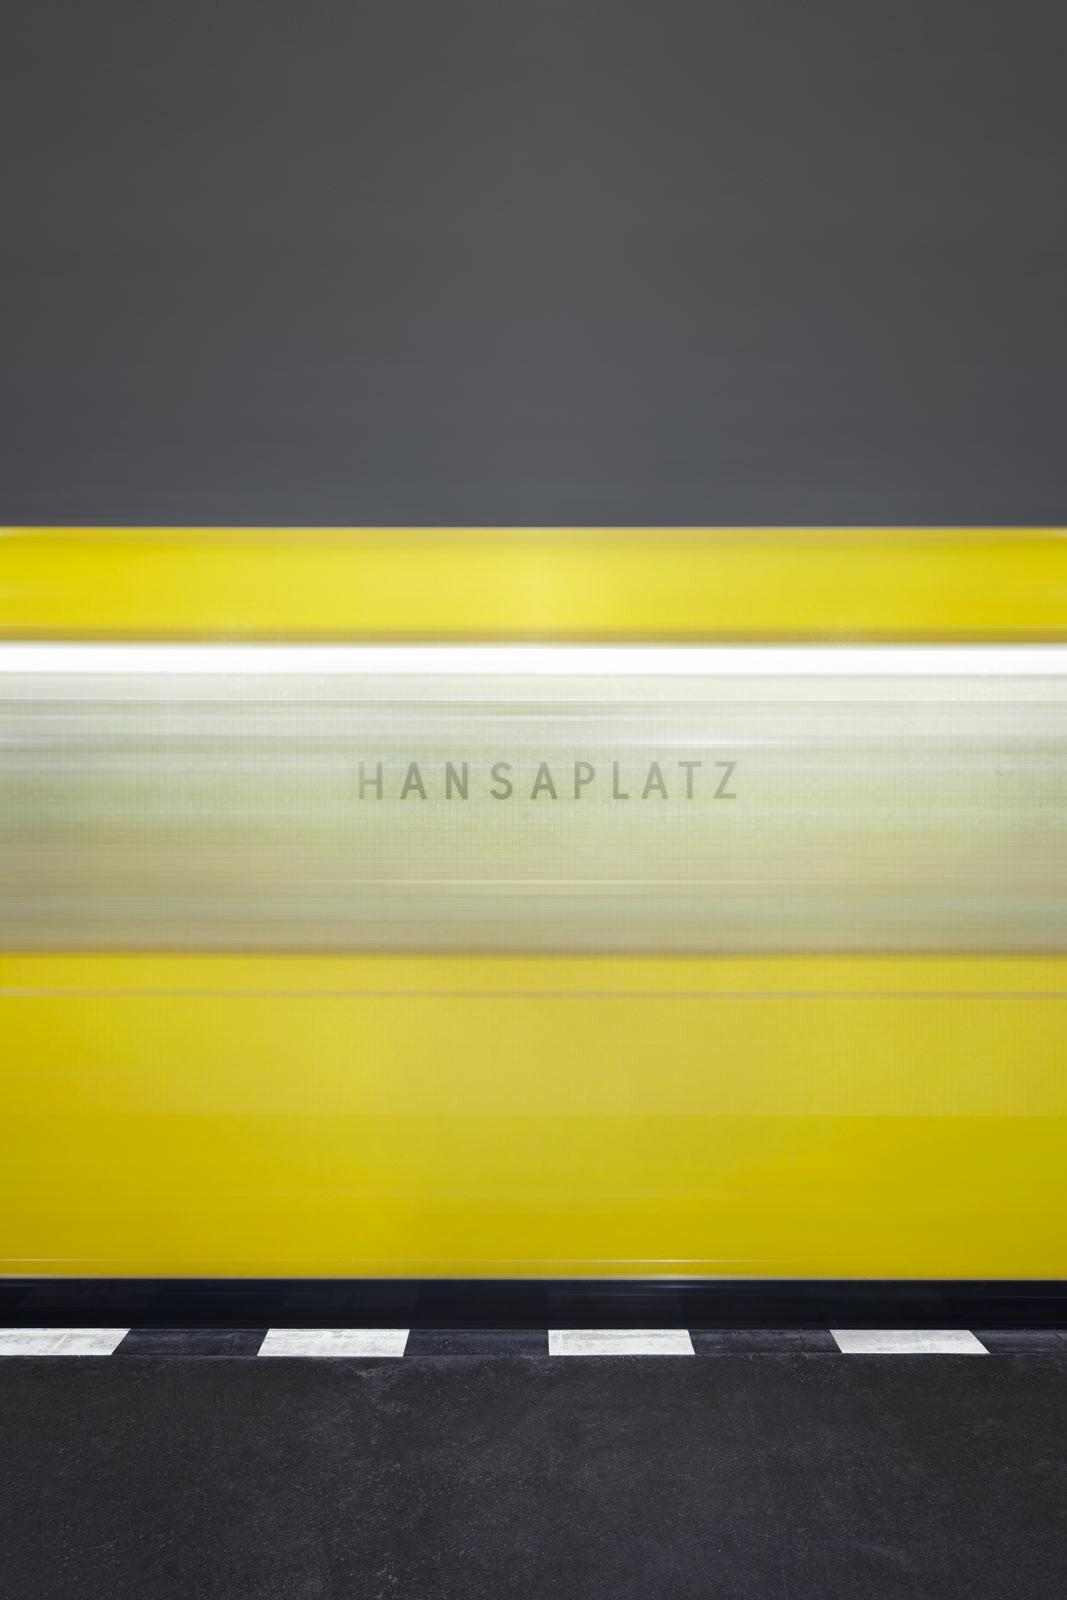 Hansaplatz - Annika Feuss